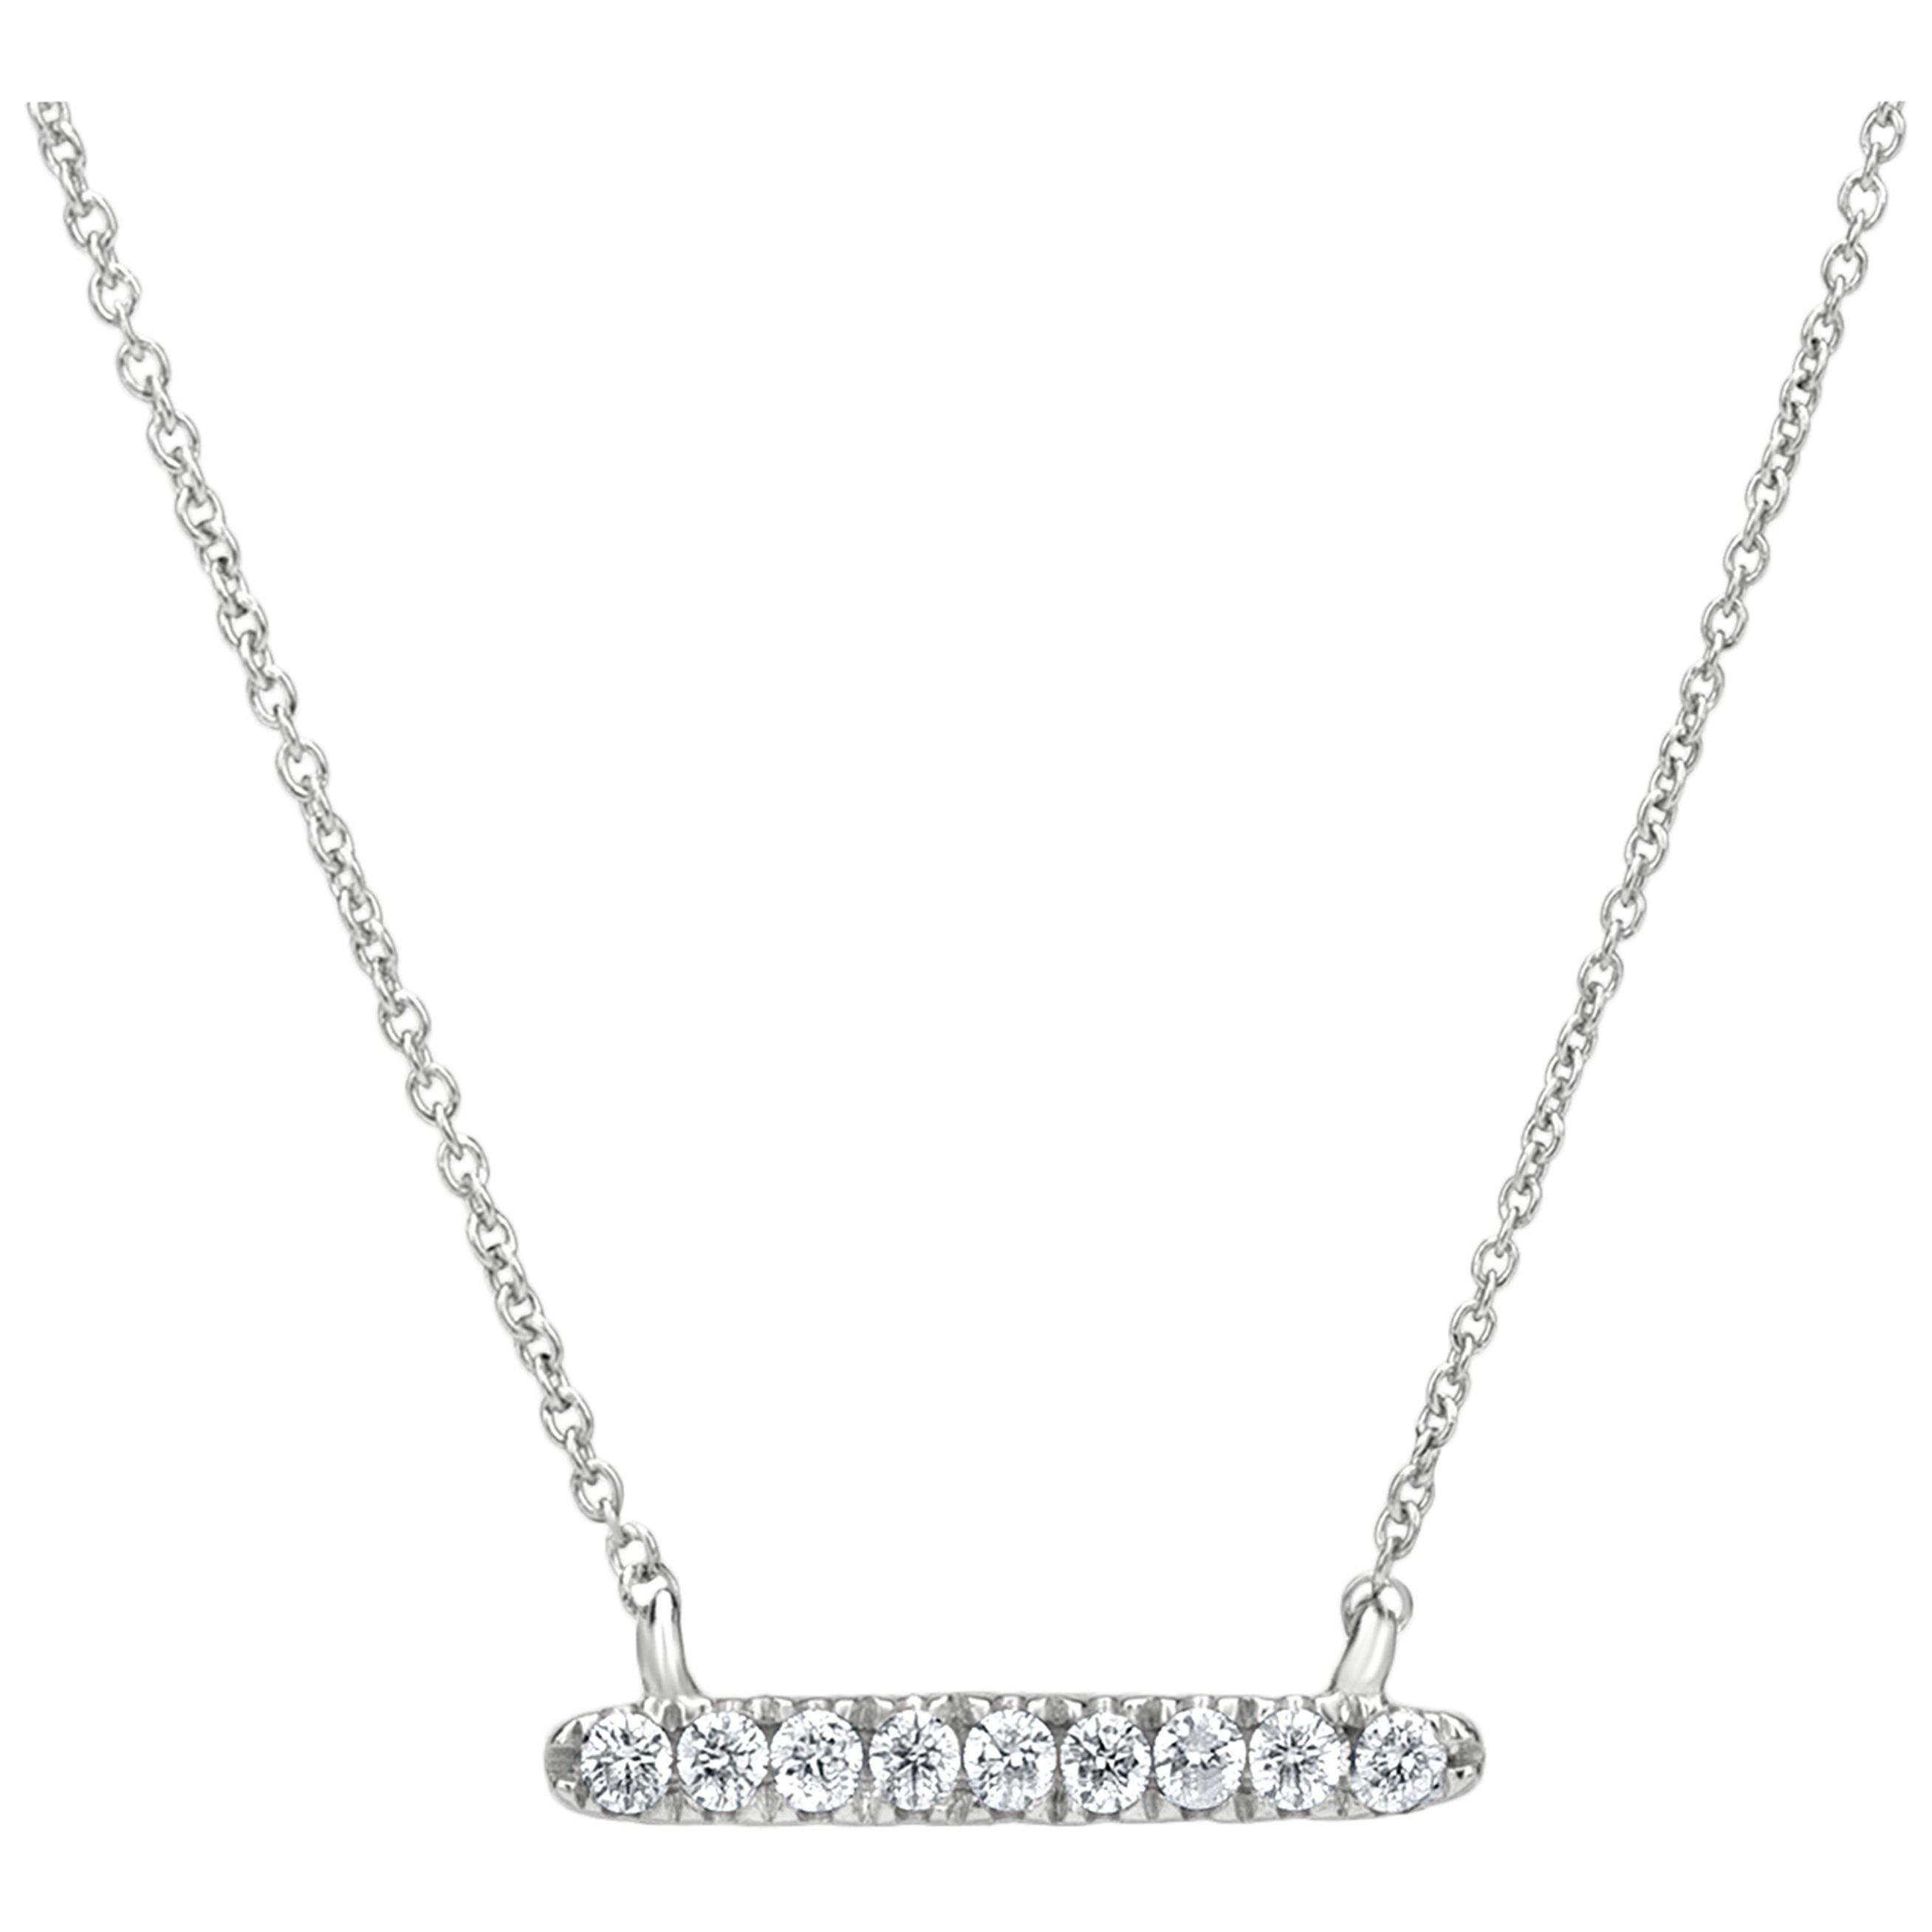 Diamond Bar Pendant Necklace in 18K White Gold